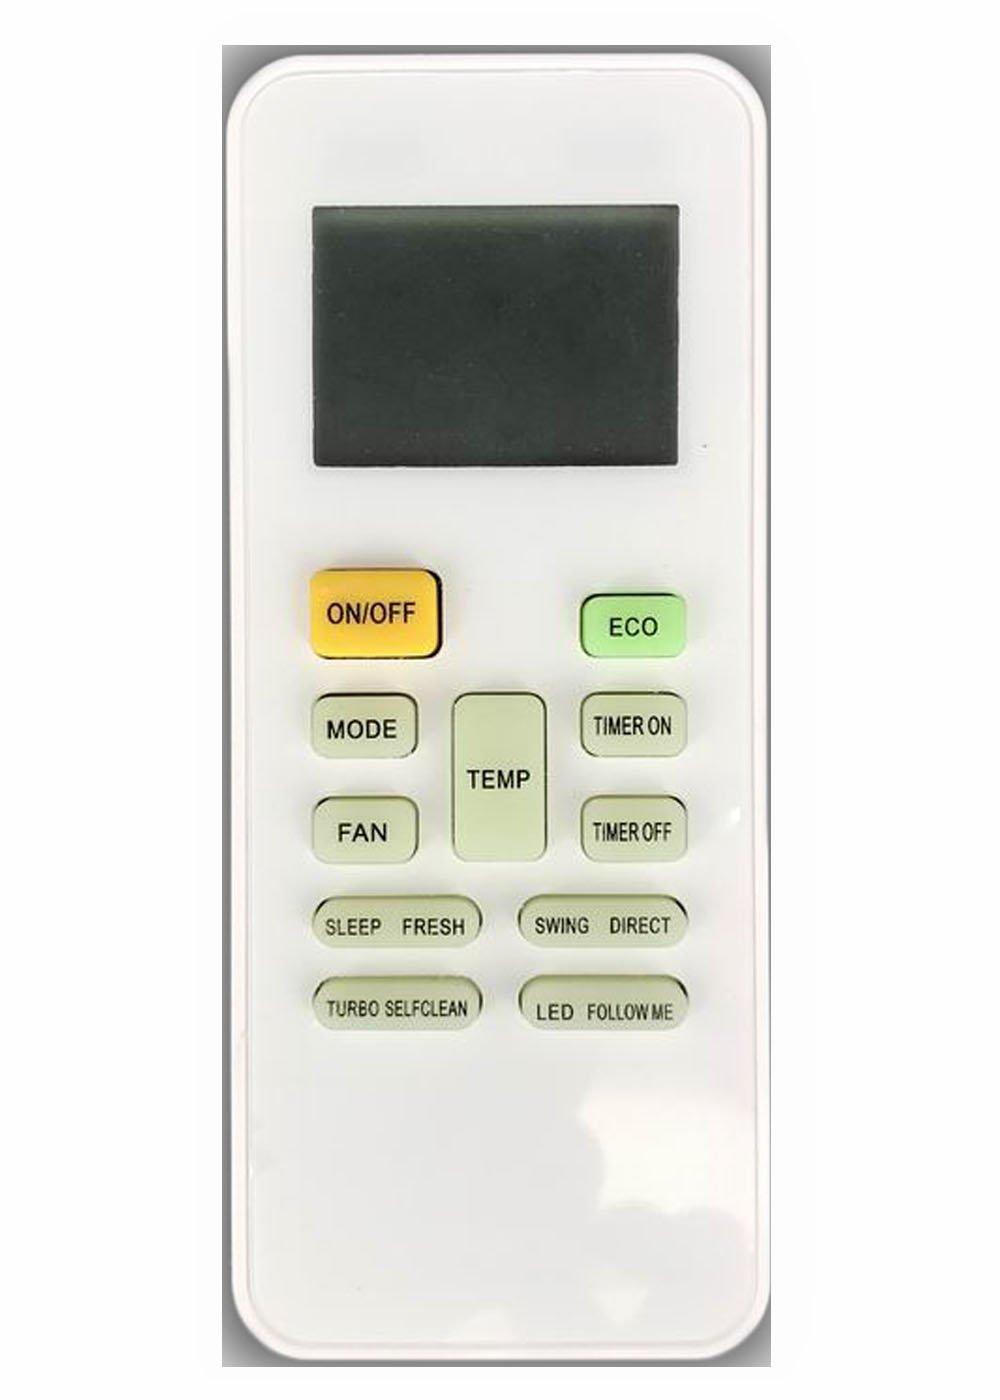 Meide RG52B/BGCE AC Remote Control For Midea Carrier Springer Window Wall Mounted Portable Remote Controller Air Conditioner Air Conditioning RN02A/B RG52B/BGE